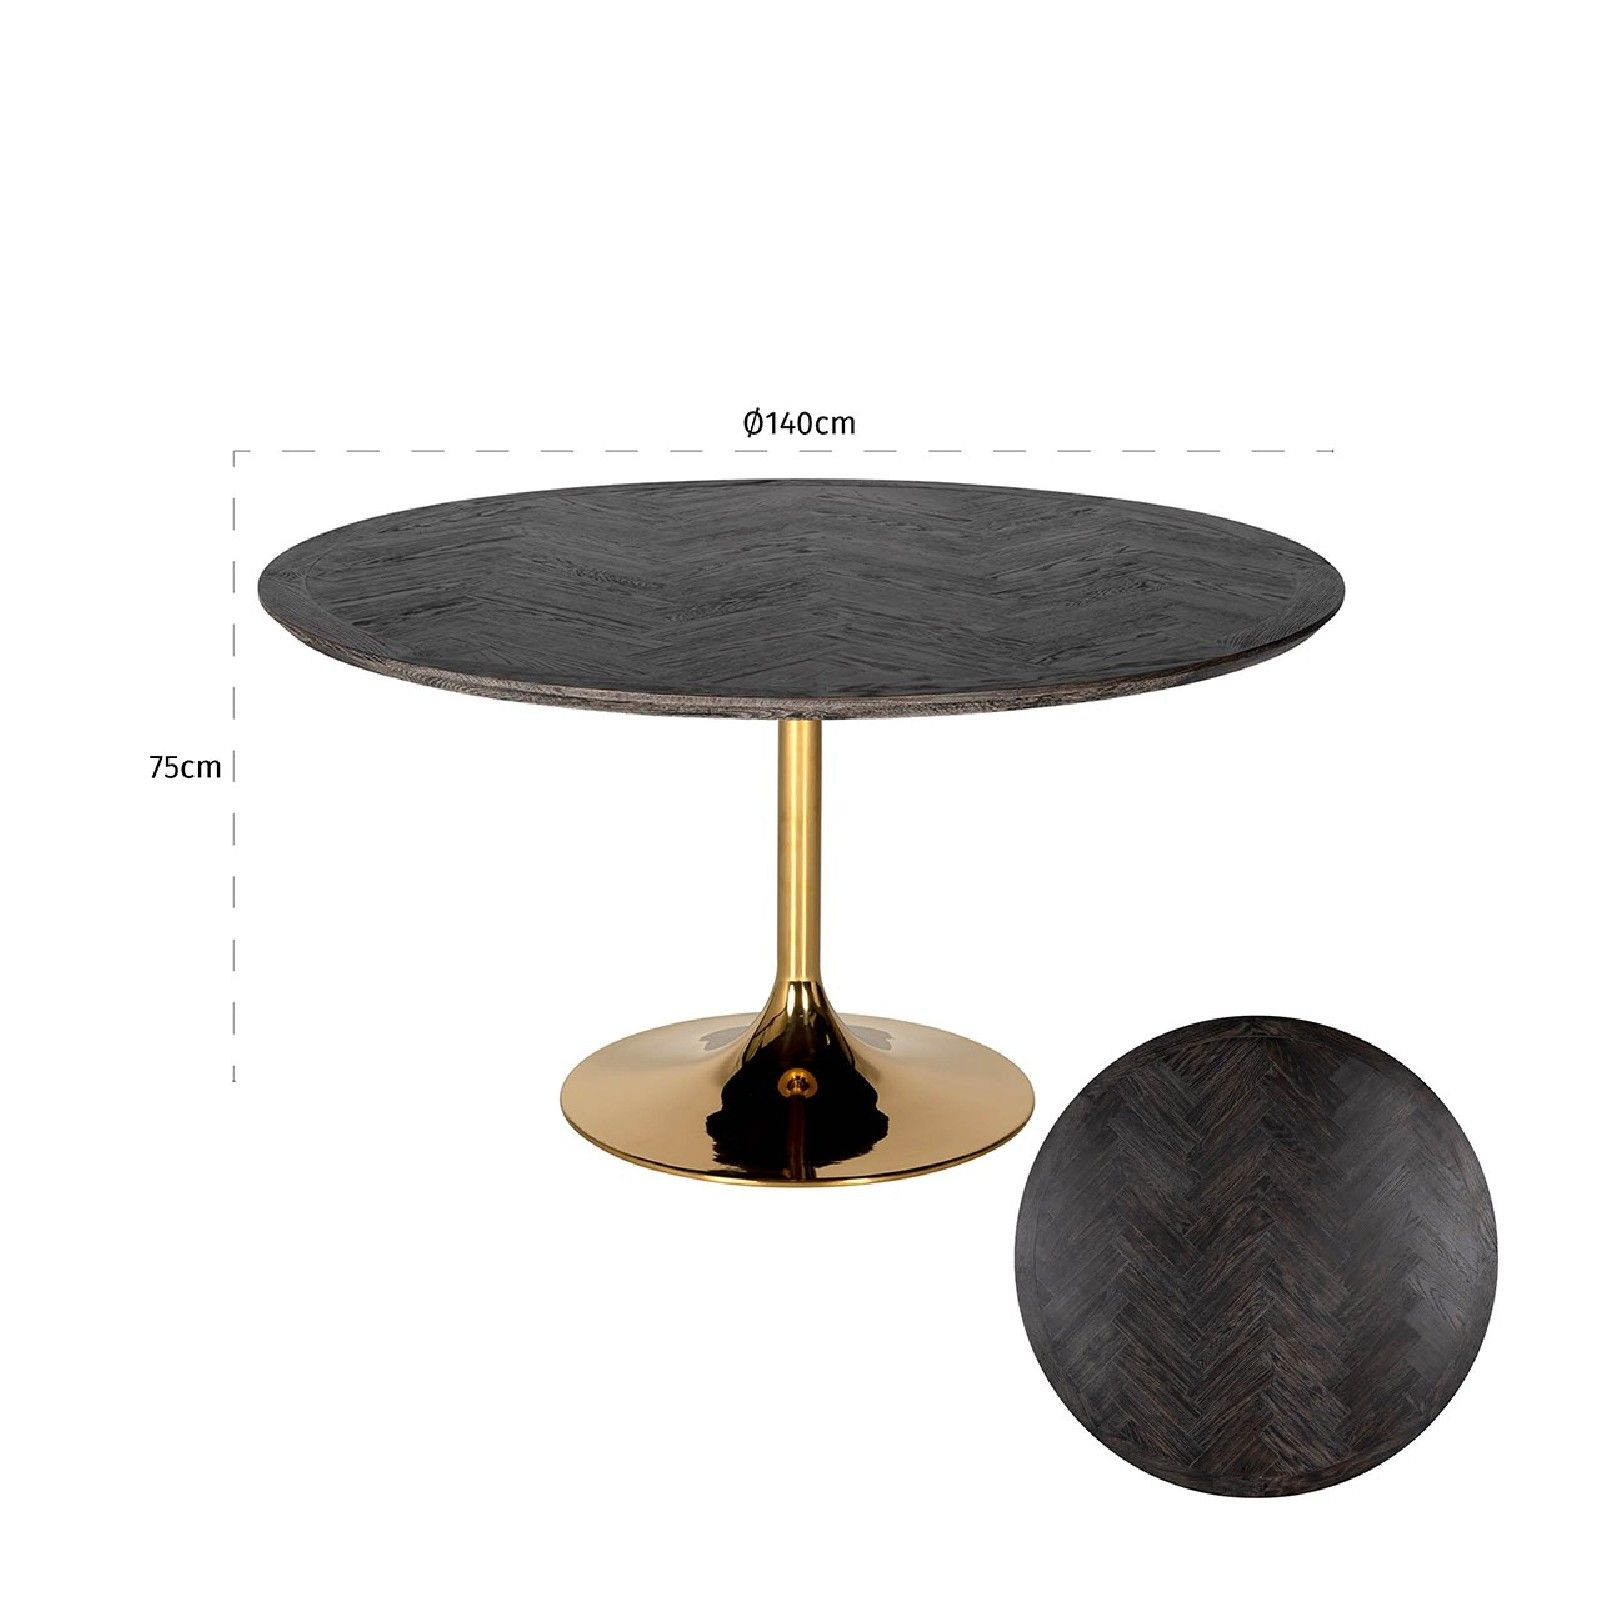 Table à dîner Blackbone gold Ø140 Meuble Déco Tendance - 521